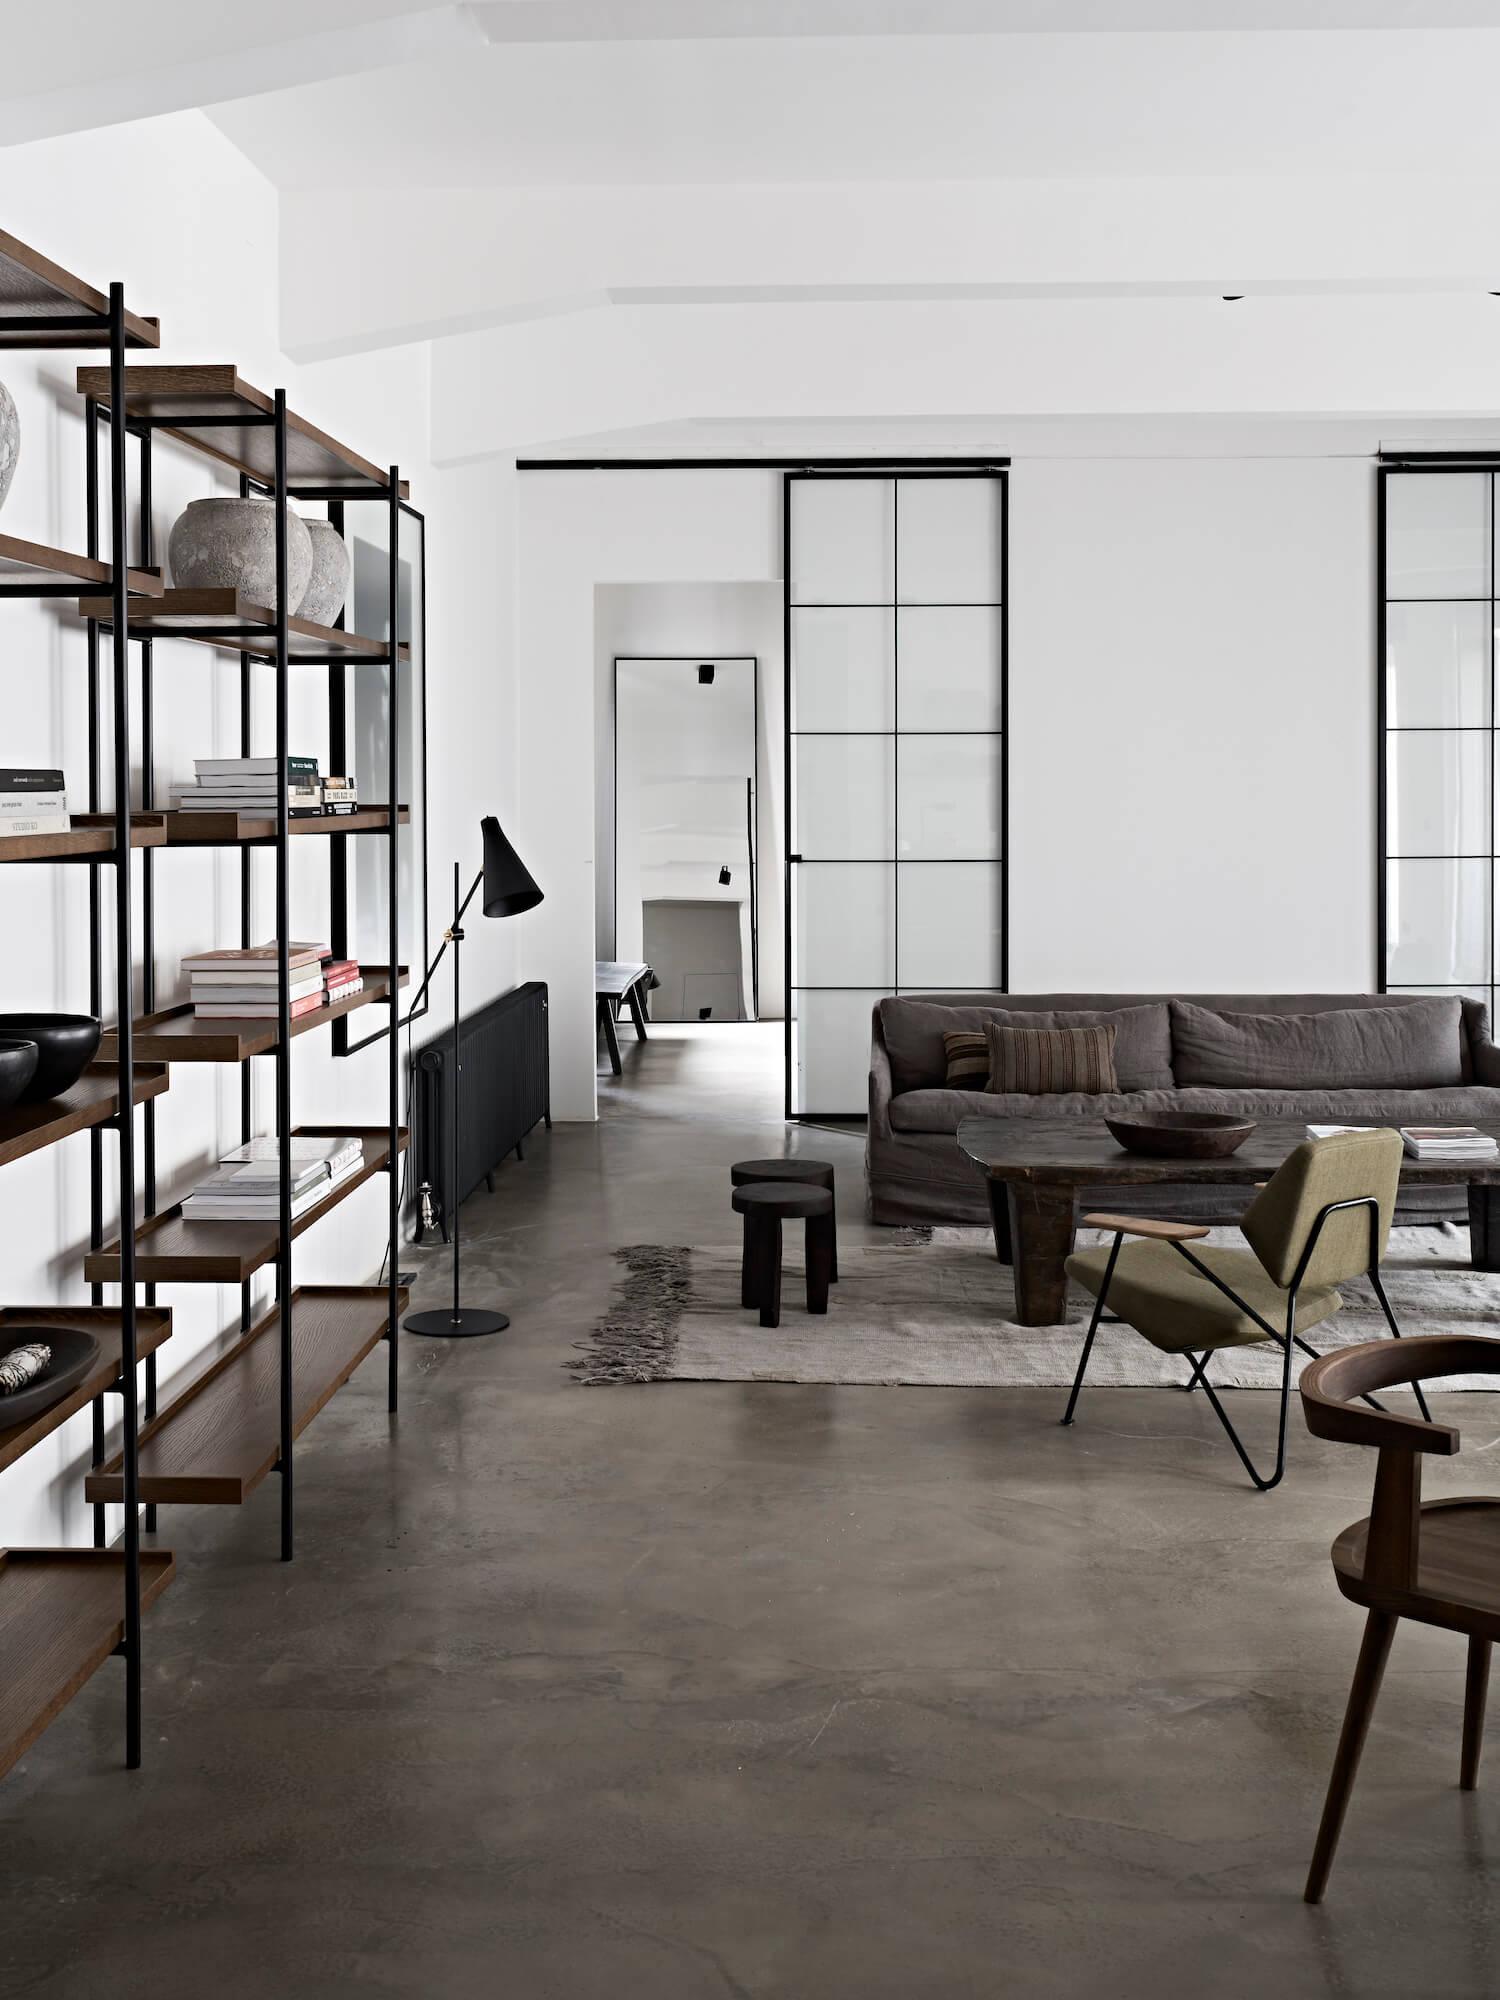 est living no ordinary apartment annabell kutucu 23